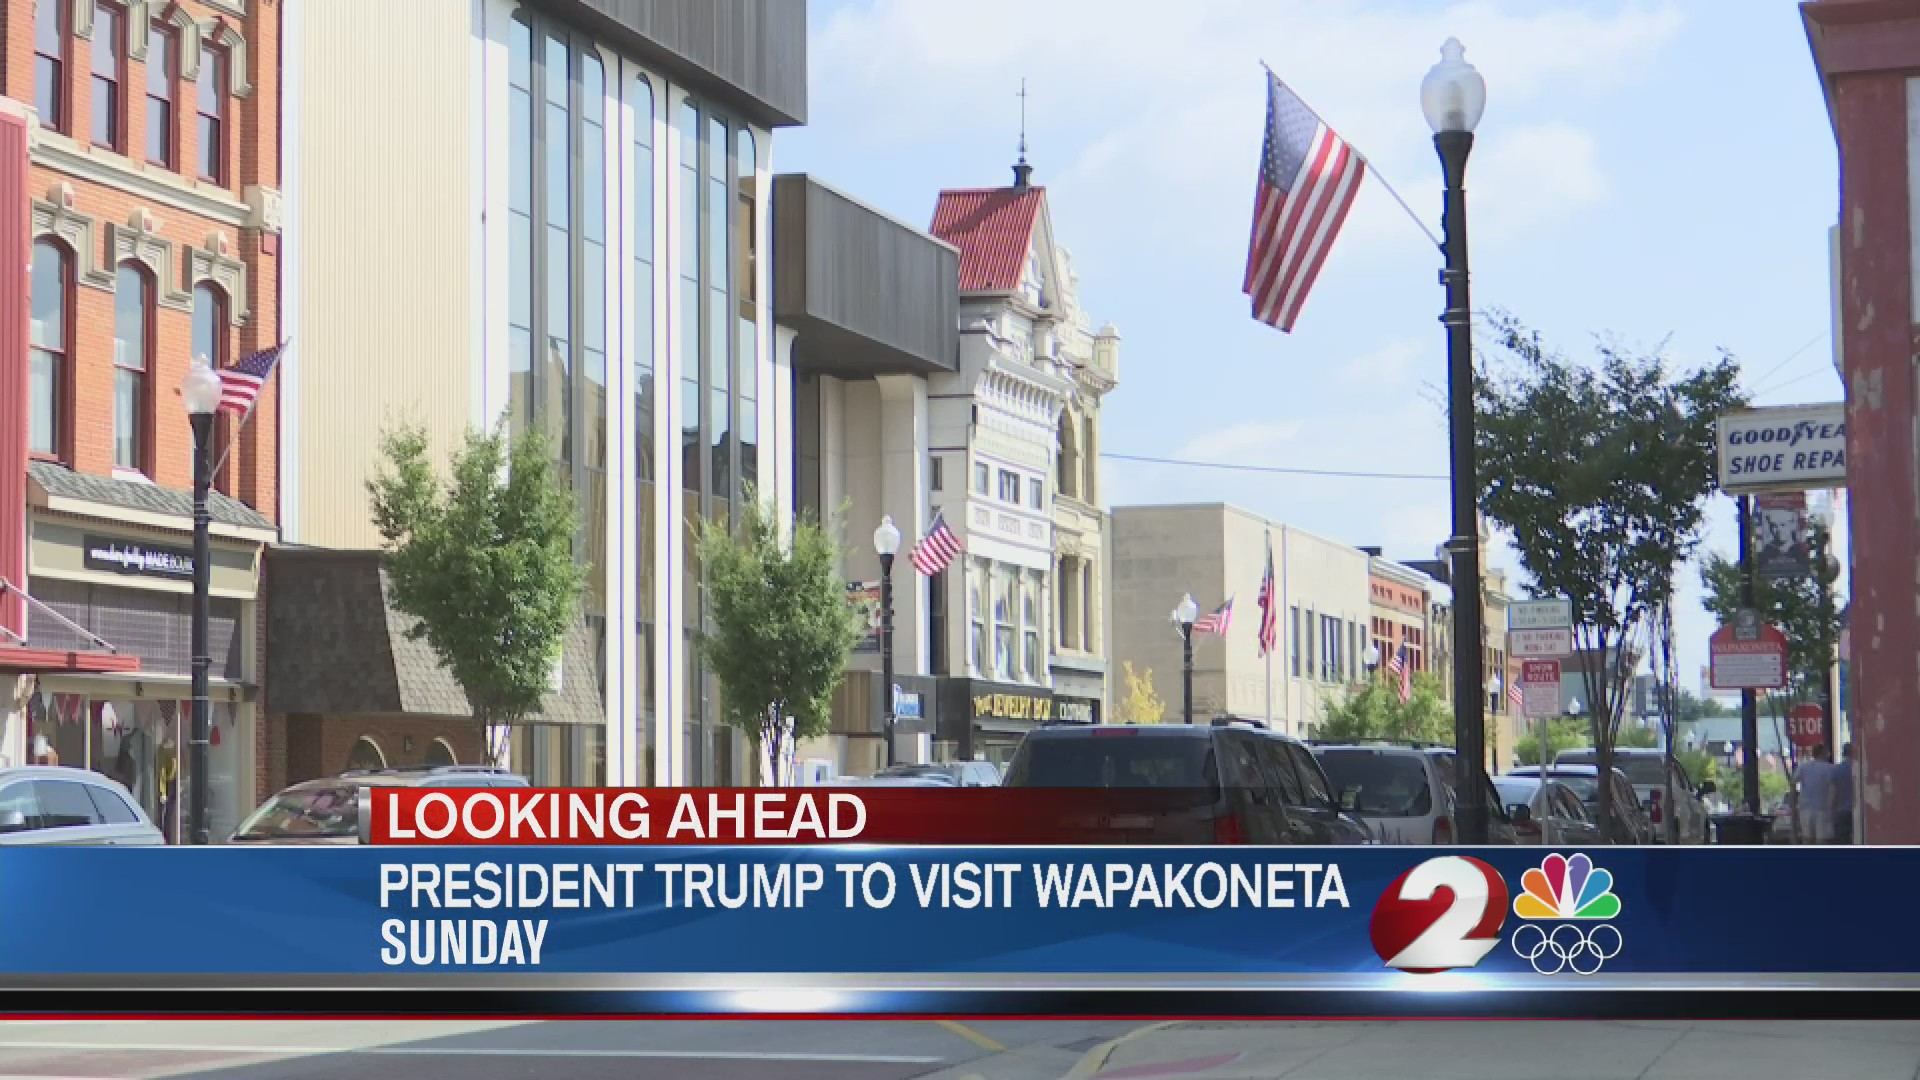 President Trump to visit Wapakoneta